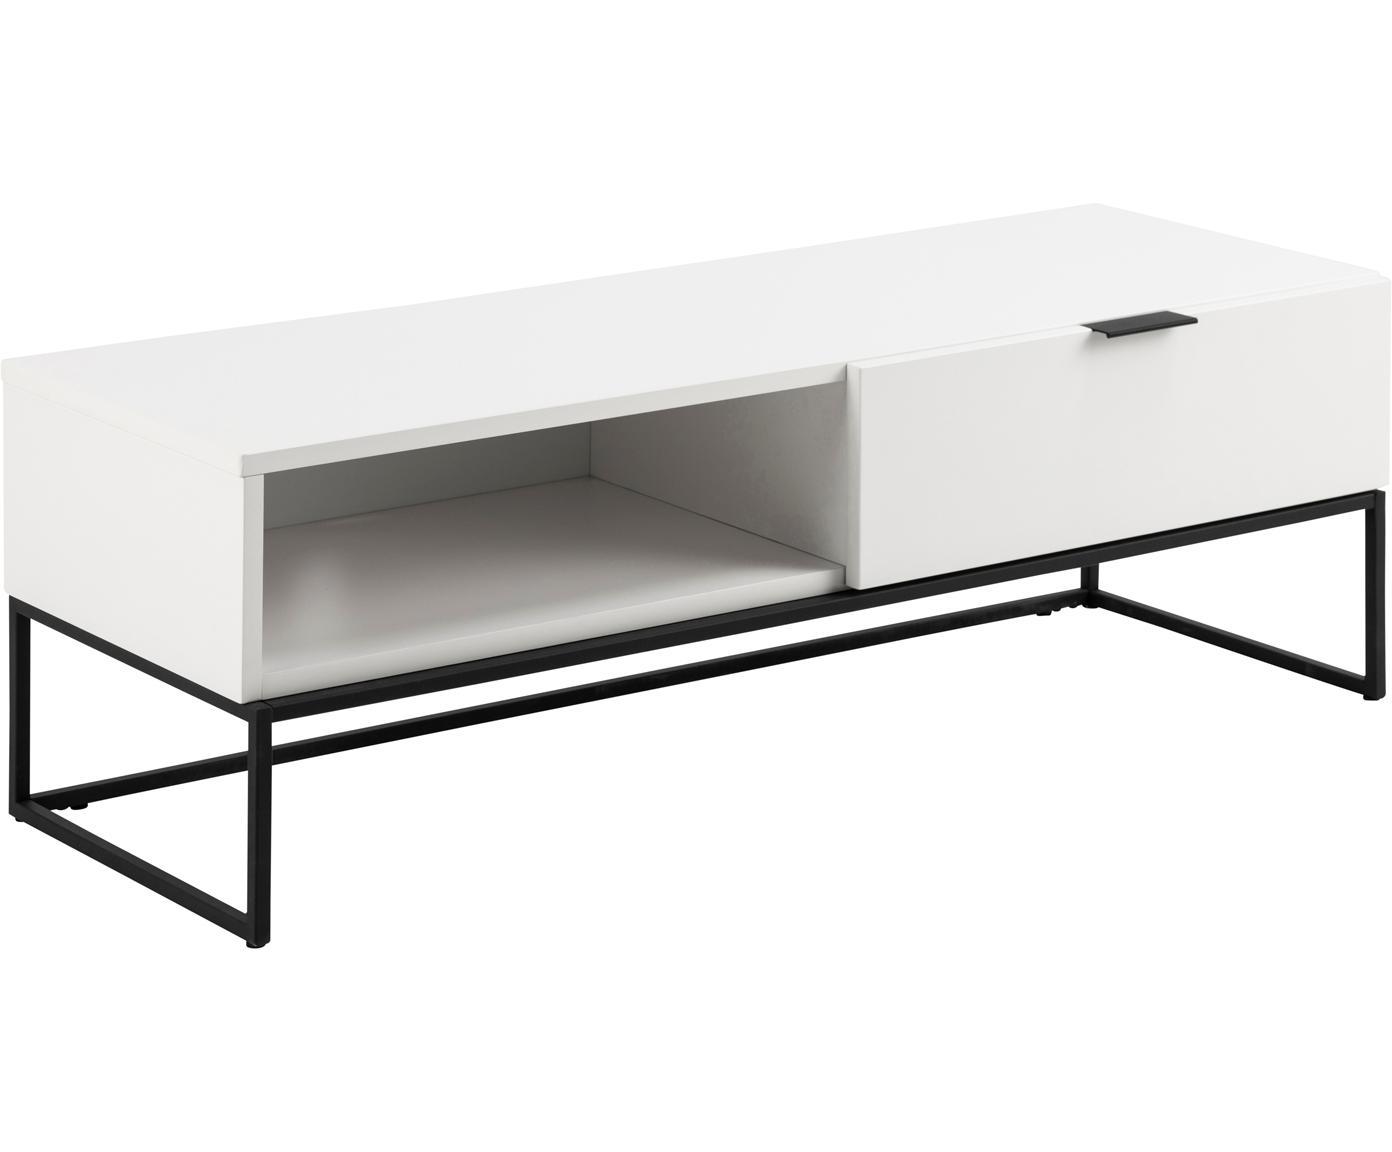 Mueble TV Kobe, Estructura: tablero de fibras de dens, Blanco, negro, An 120 x Al 40 cm